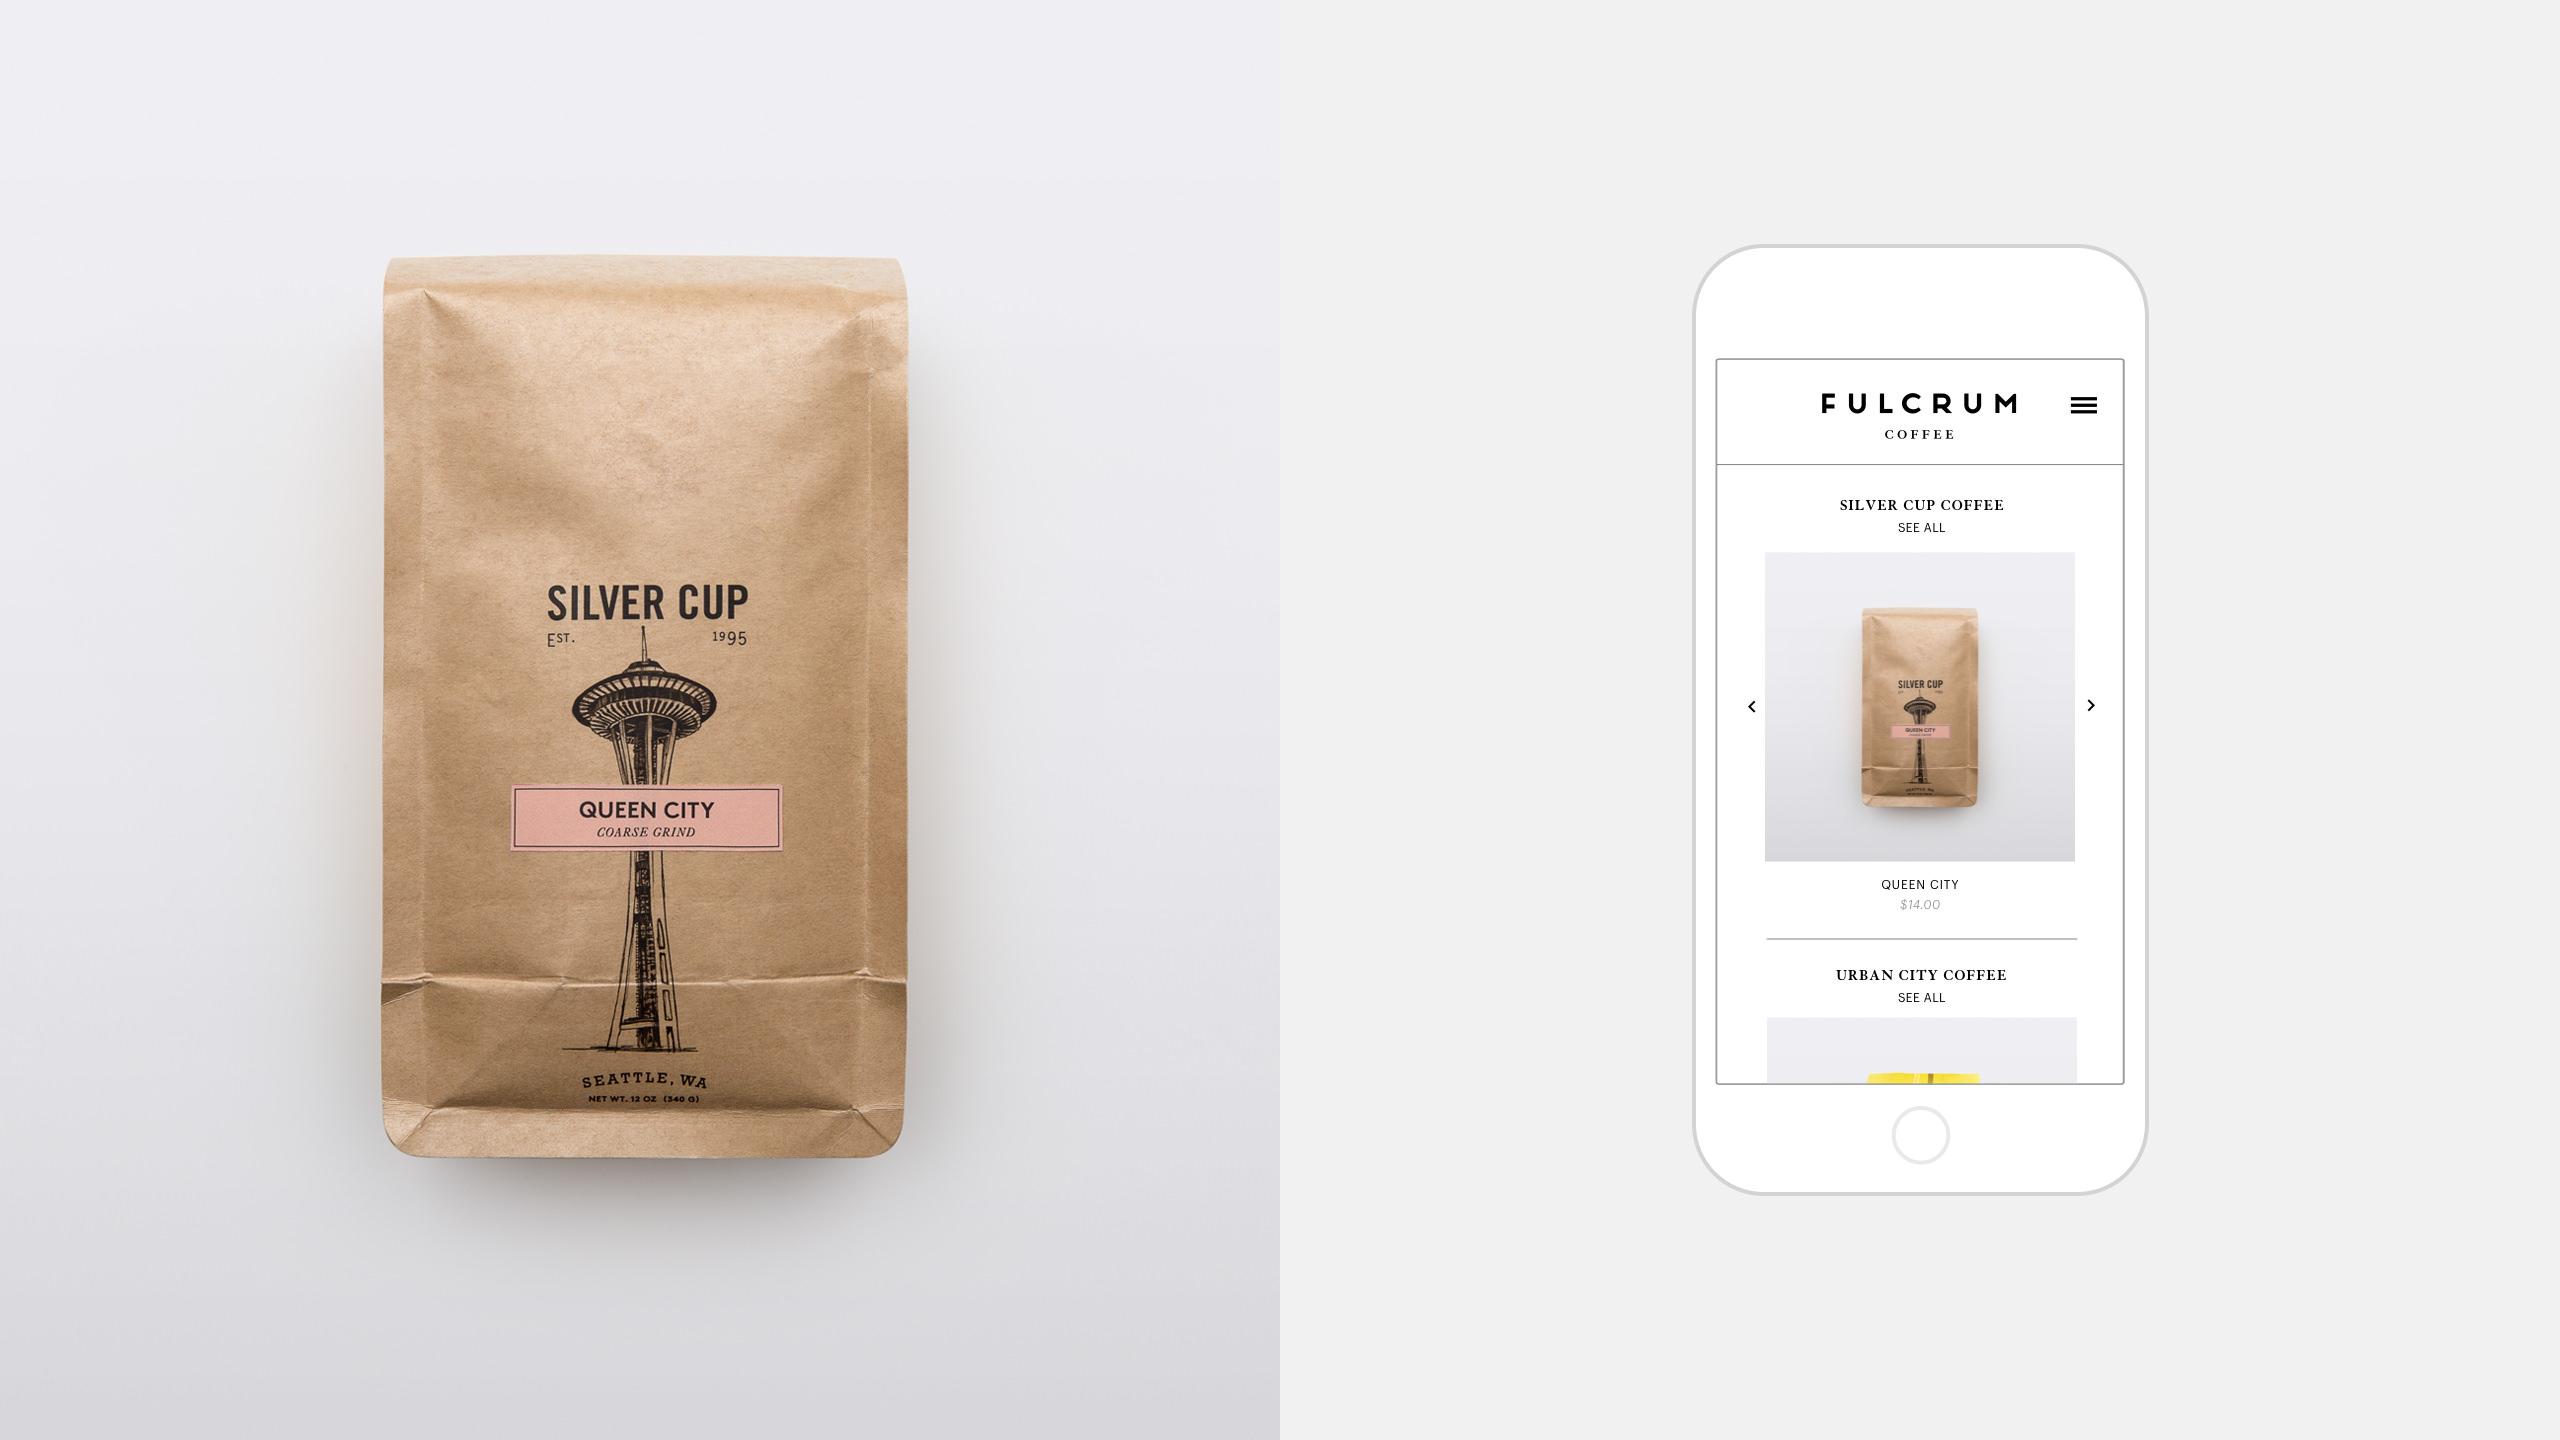 tolleson-case-study-fulcrum-coffee-interactive-13